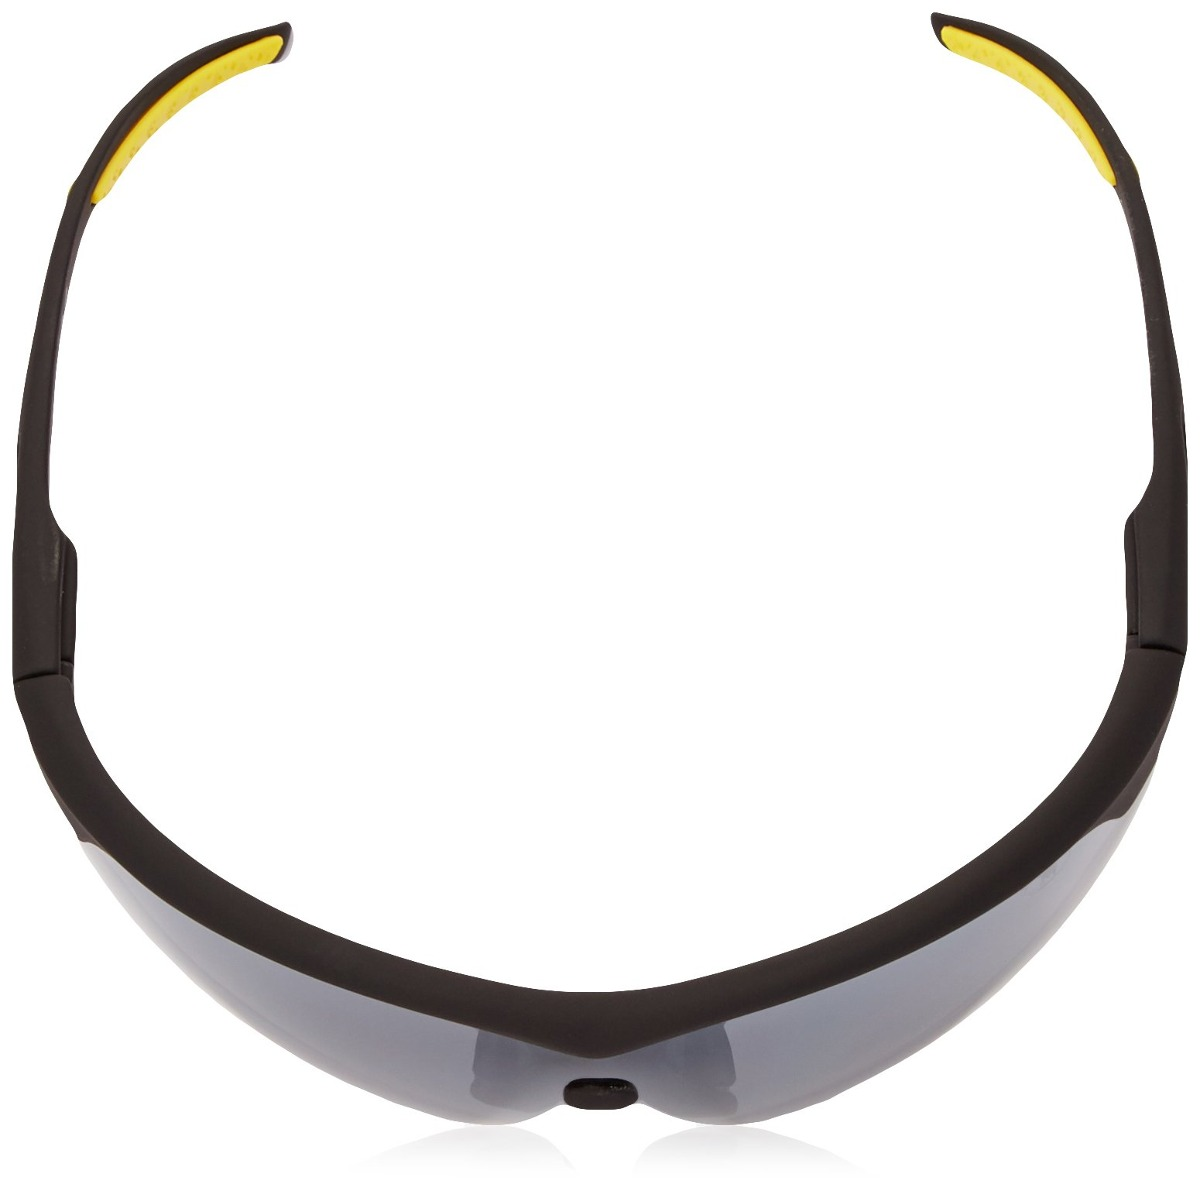 88b99fc879 gafas de sol ironman tenacity wrap, negro mate, goma, 136. Cargando zoom.